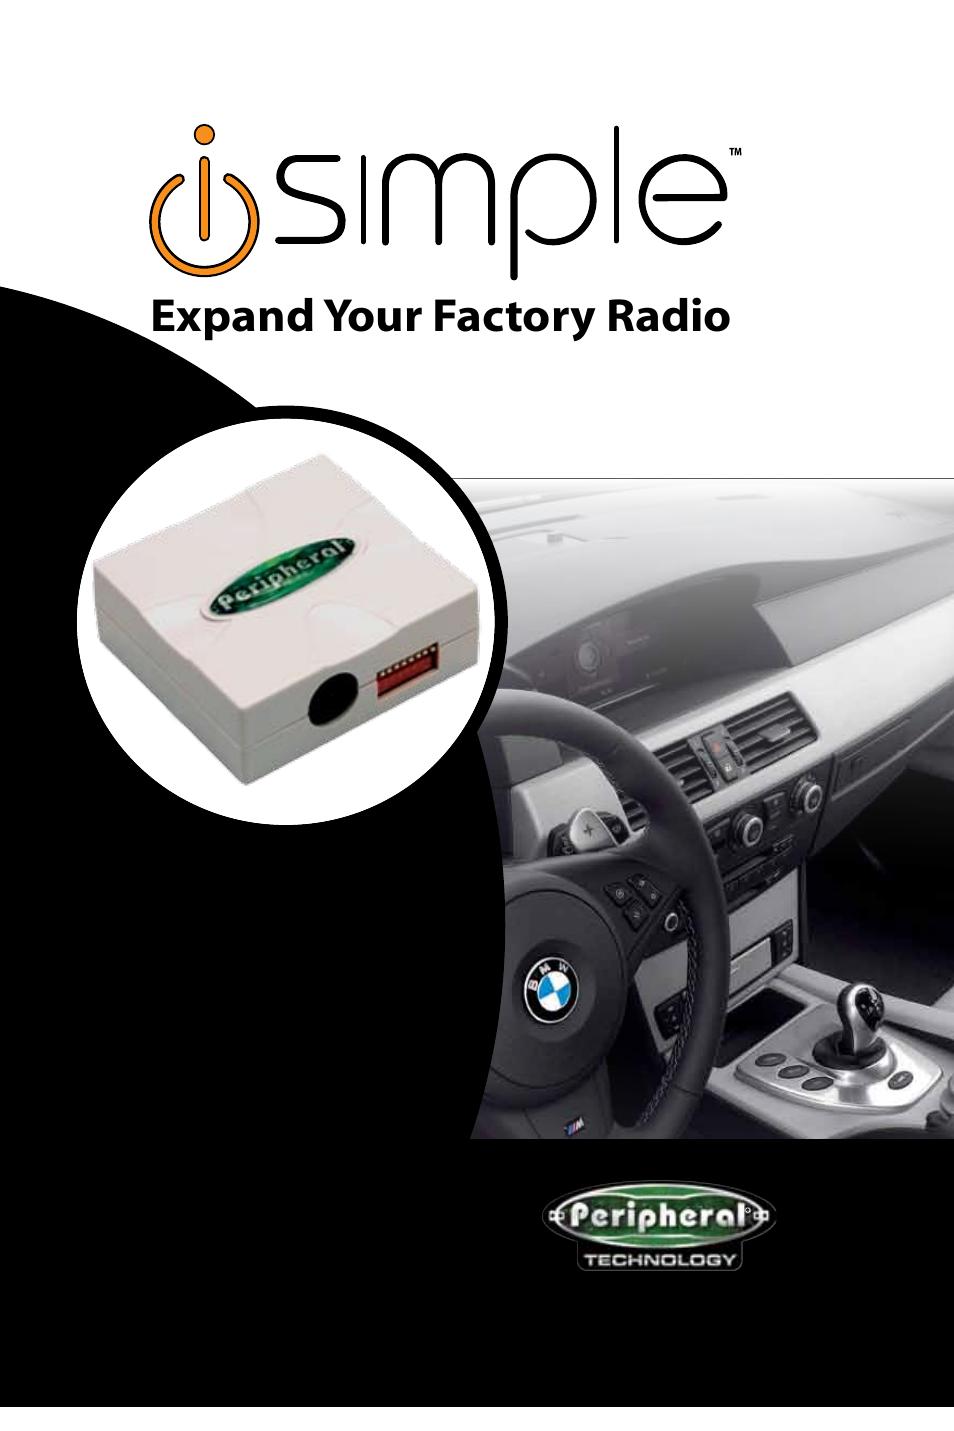 peripheral electronics isbm72 user manual 8 pages rh manualsdir com BMW Backup Camera BMW 3 Series